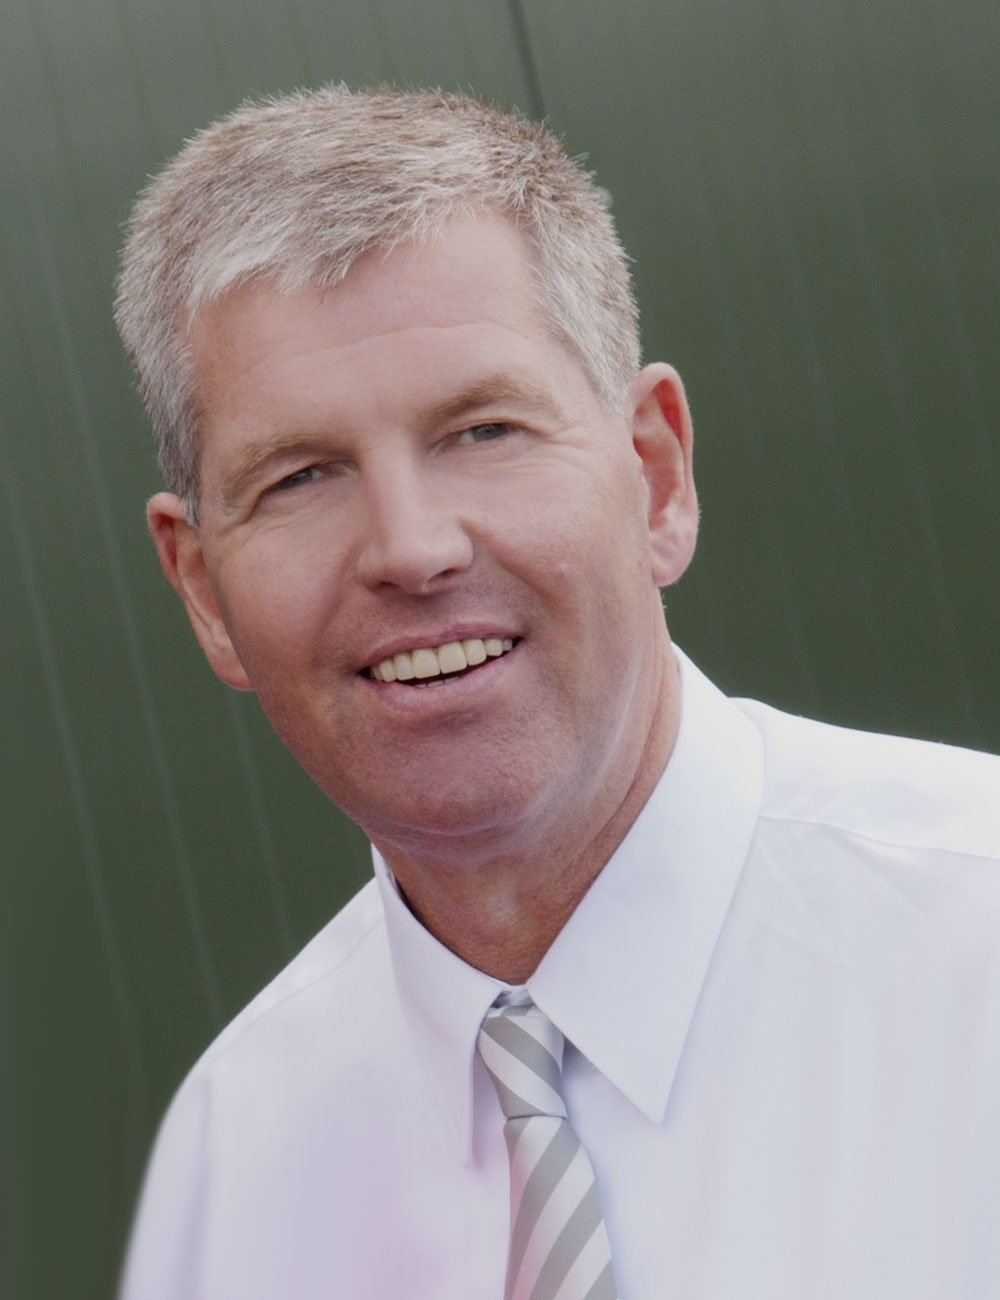 Dirk Wißing